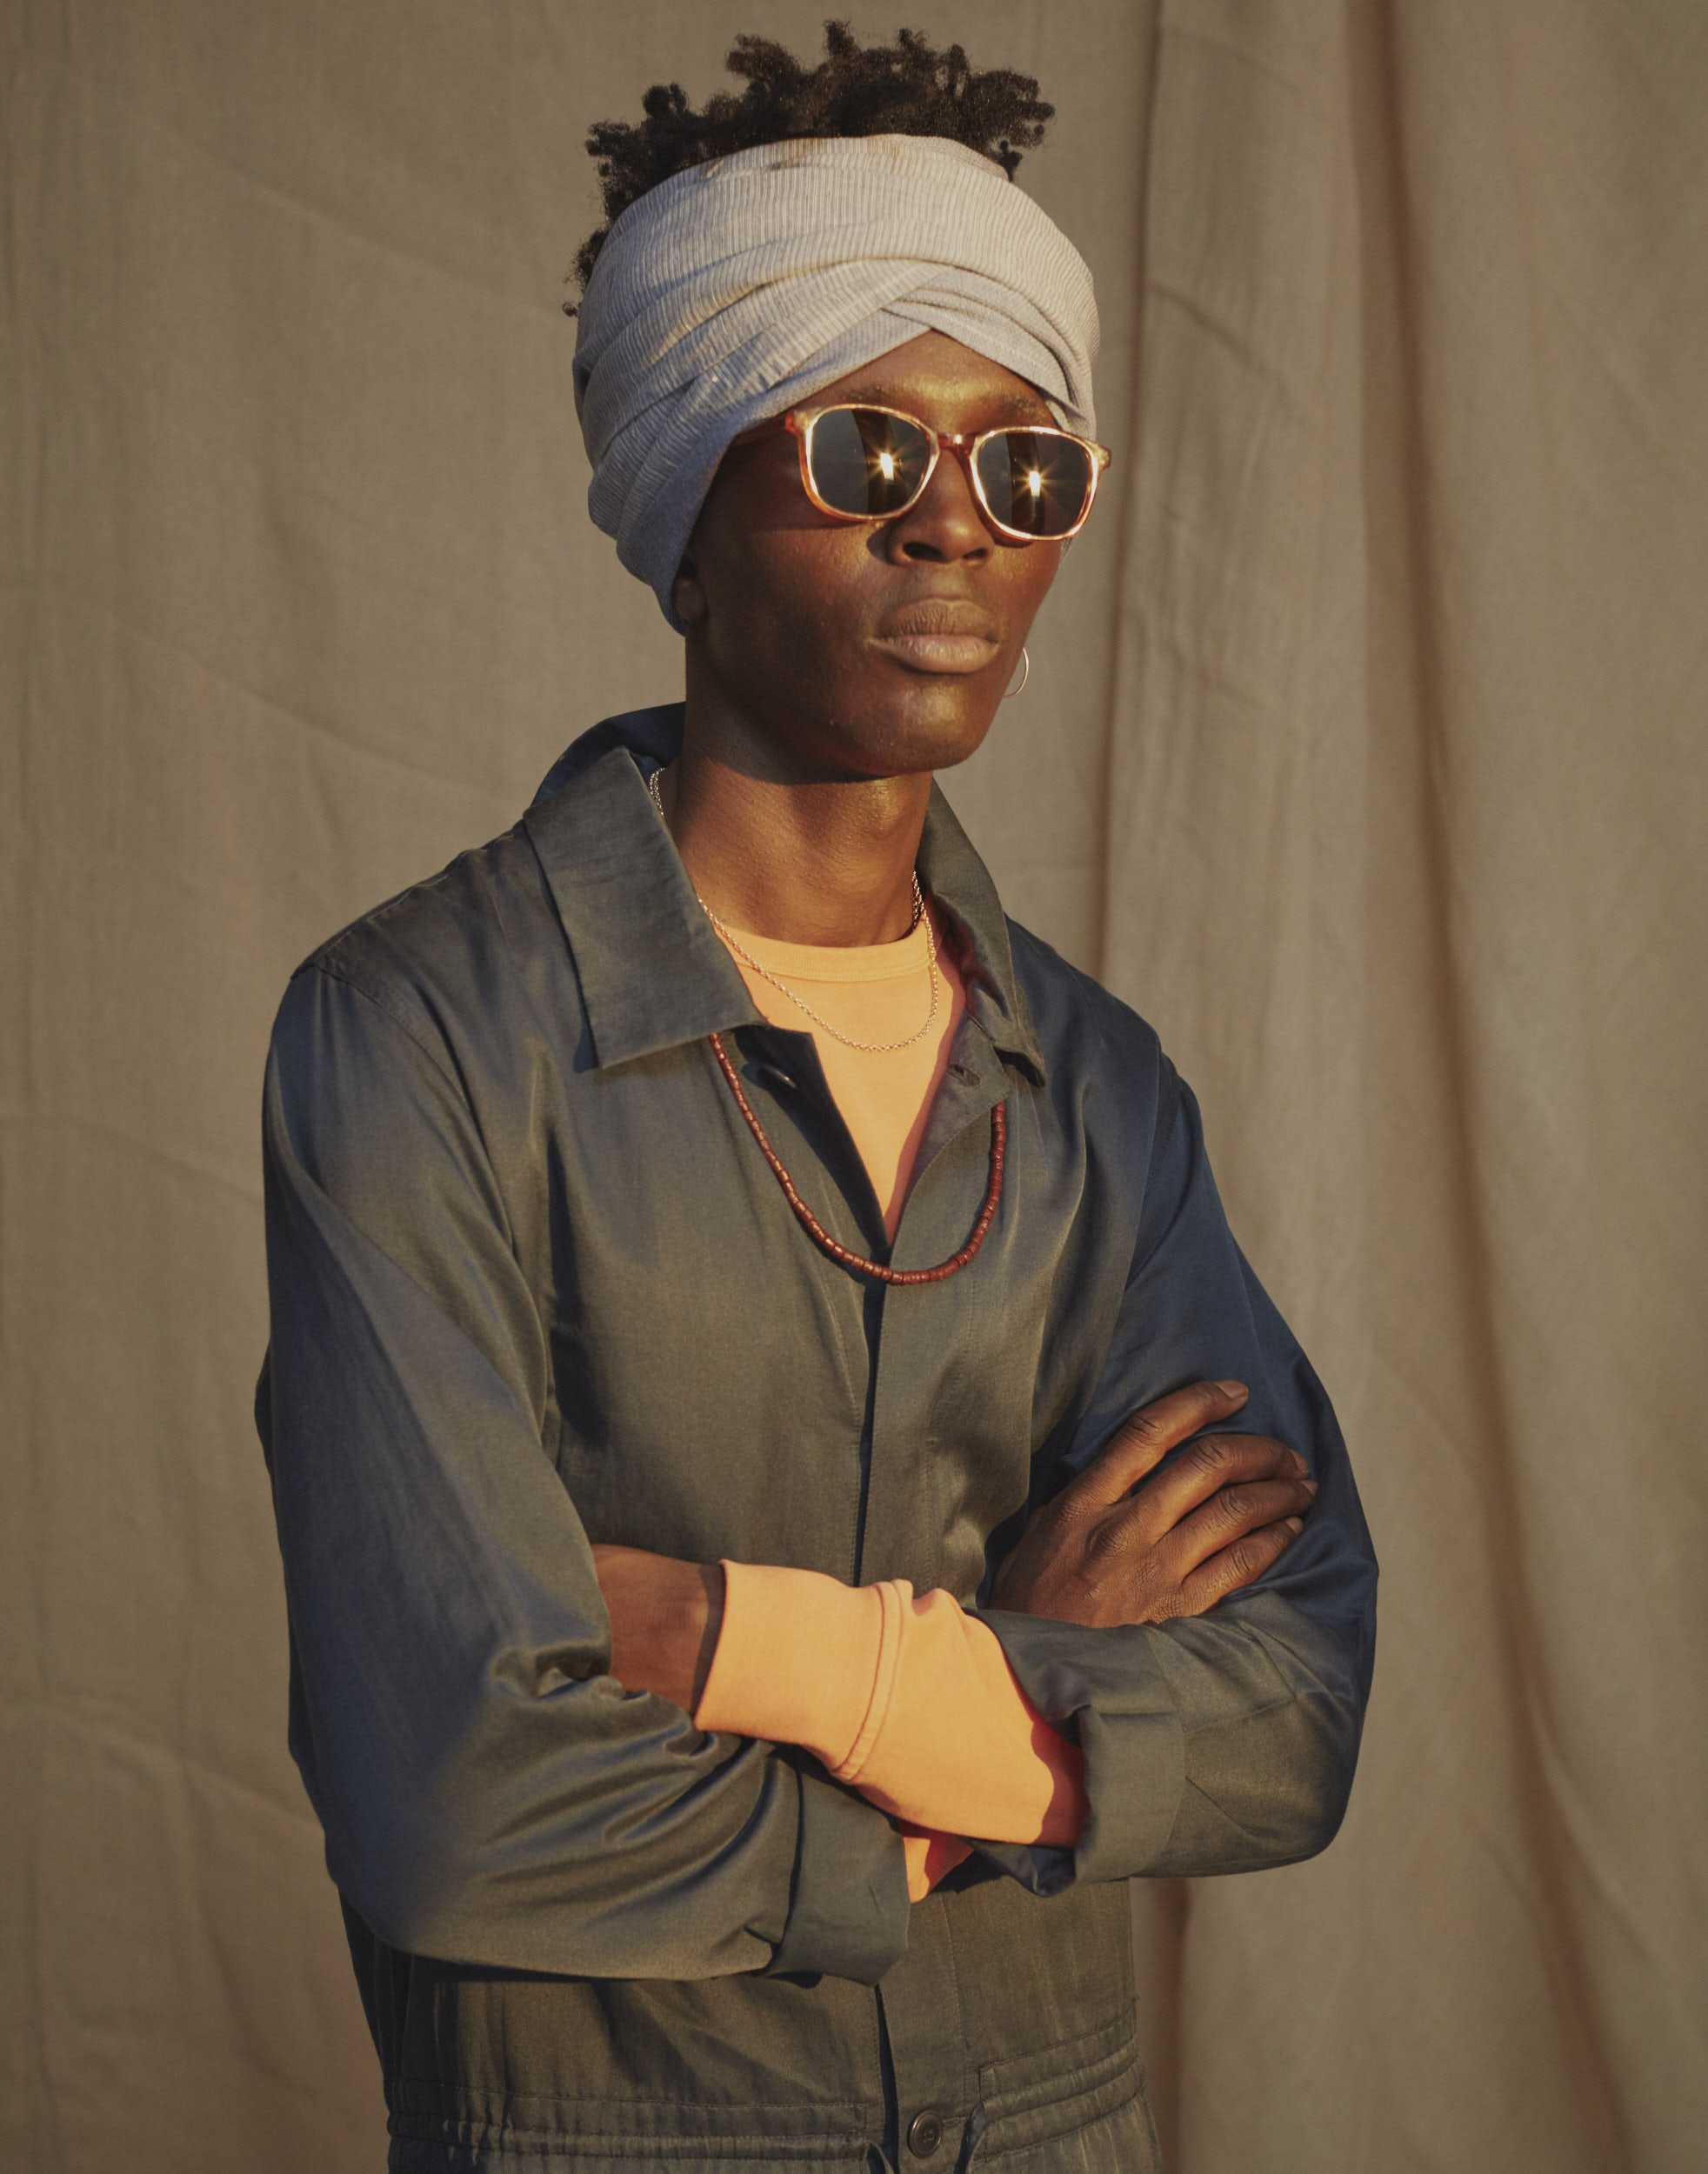 ymc-ss17-collection-okoro-men-fashion-folkr-6